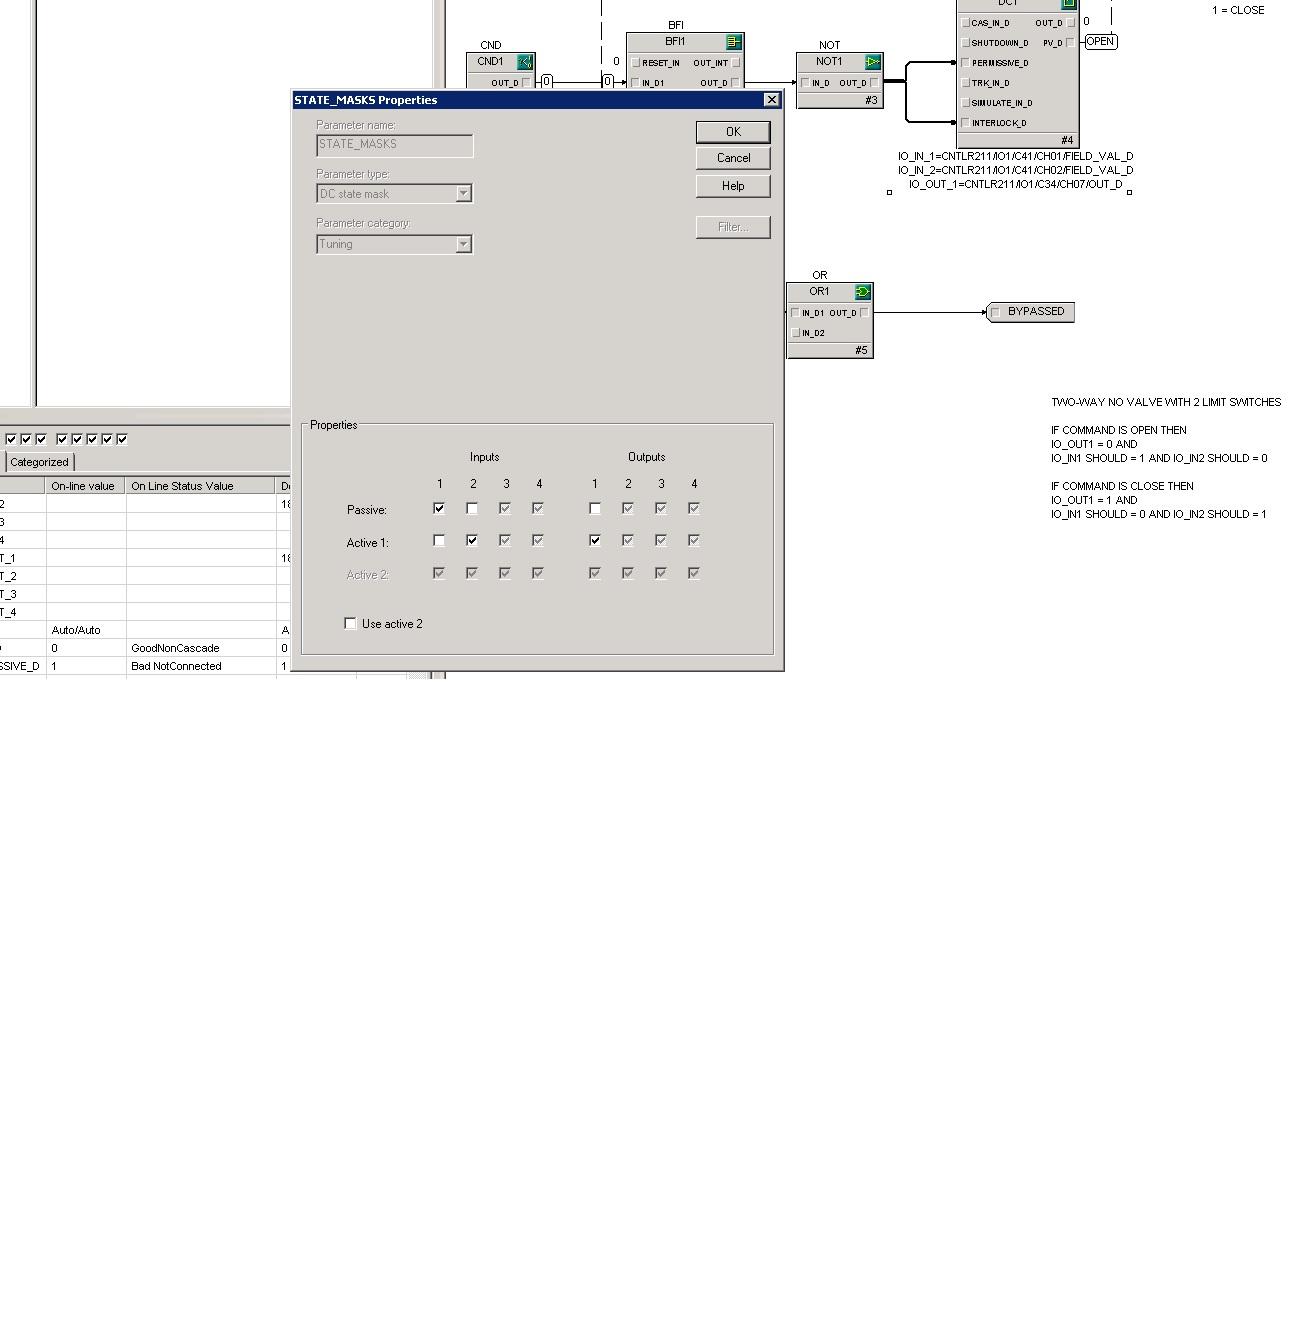 emerson exchange 365 block da igram delta sigma modulator delta v block diagram #7